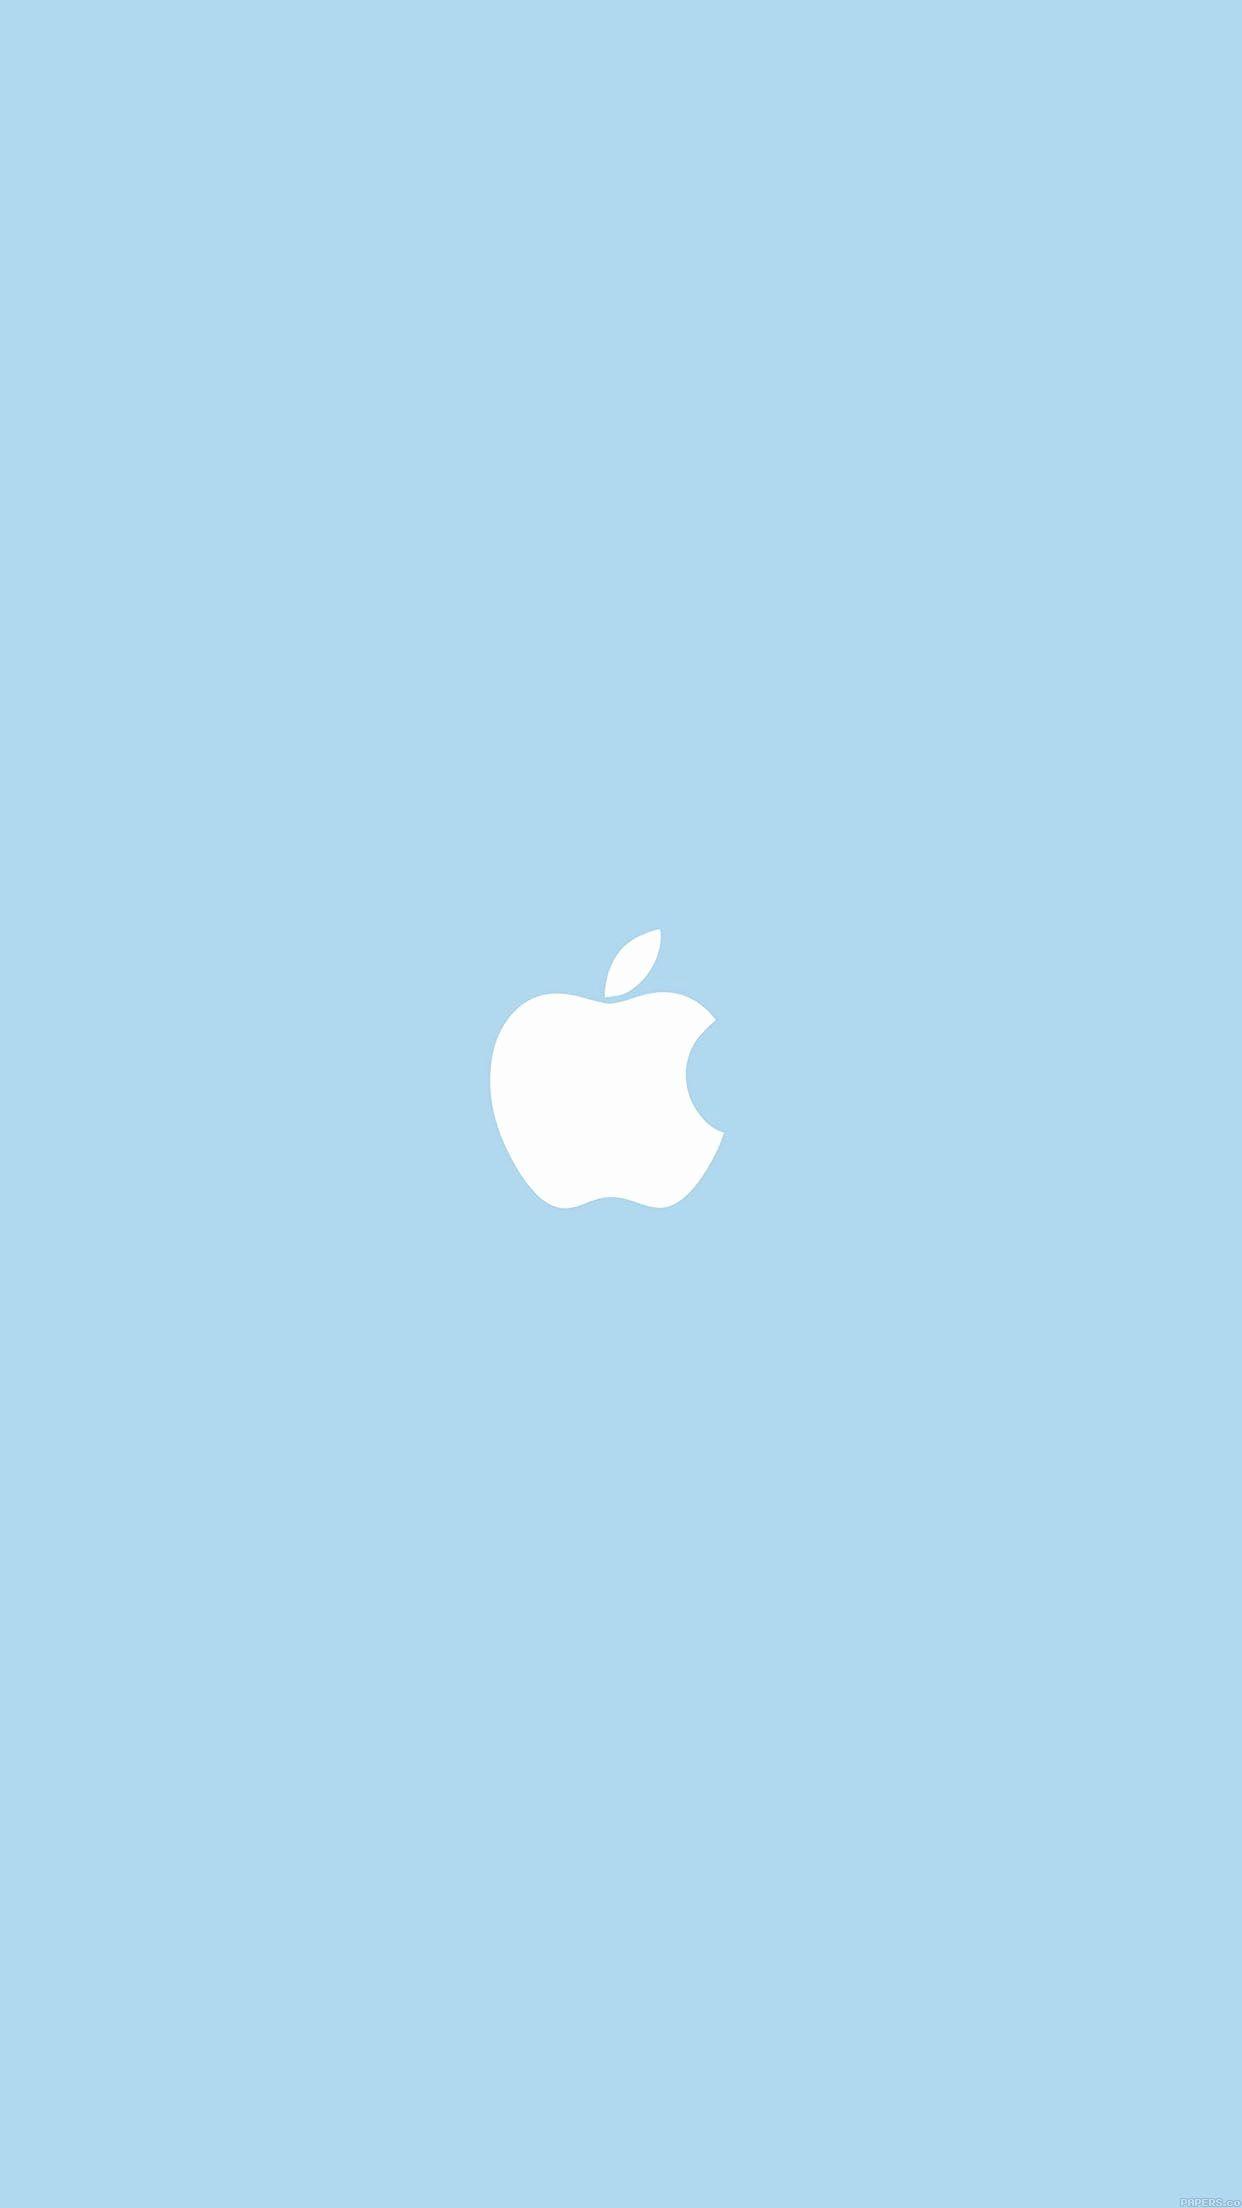 Minimalist Iphone Wallpaper Fresh Minimalist White Aesthetic Iphone Wallpaper Wallpaper En 2020 Fond D Ecran Bleu Iphone Fond Ecran Iphone 6 Fond D Ecran Iphone Pastel